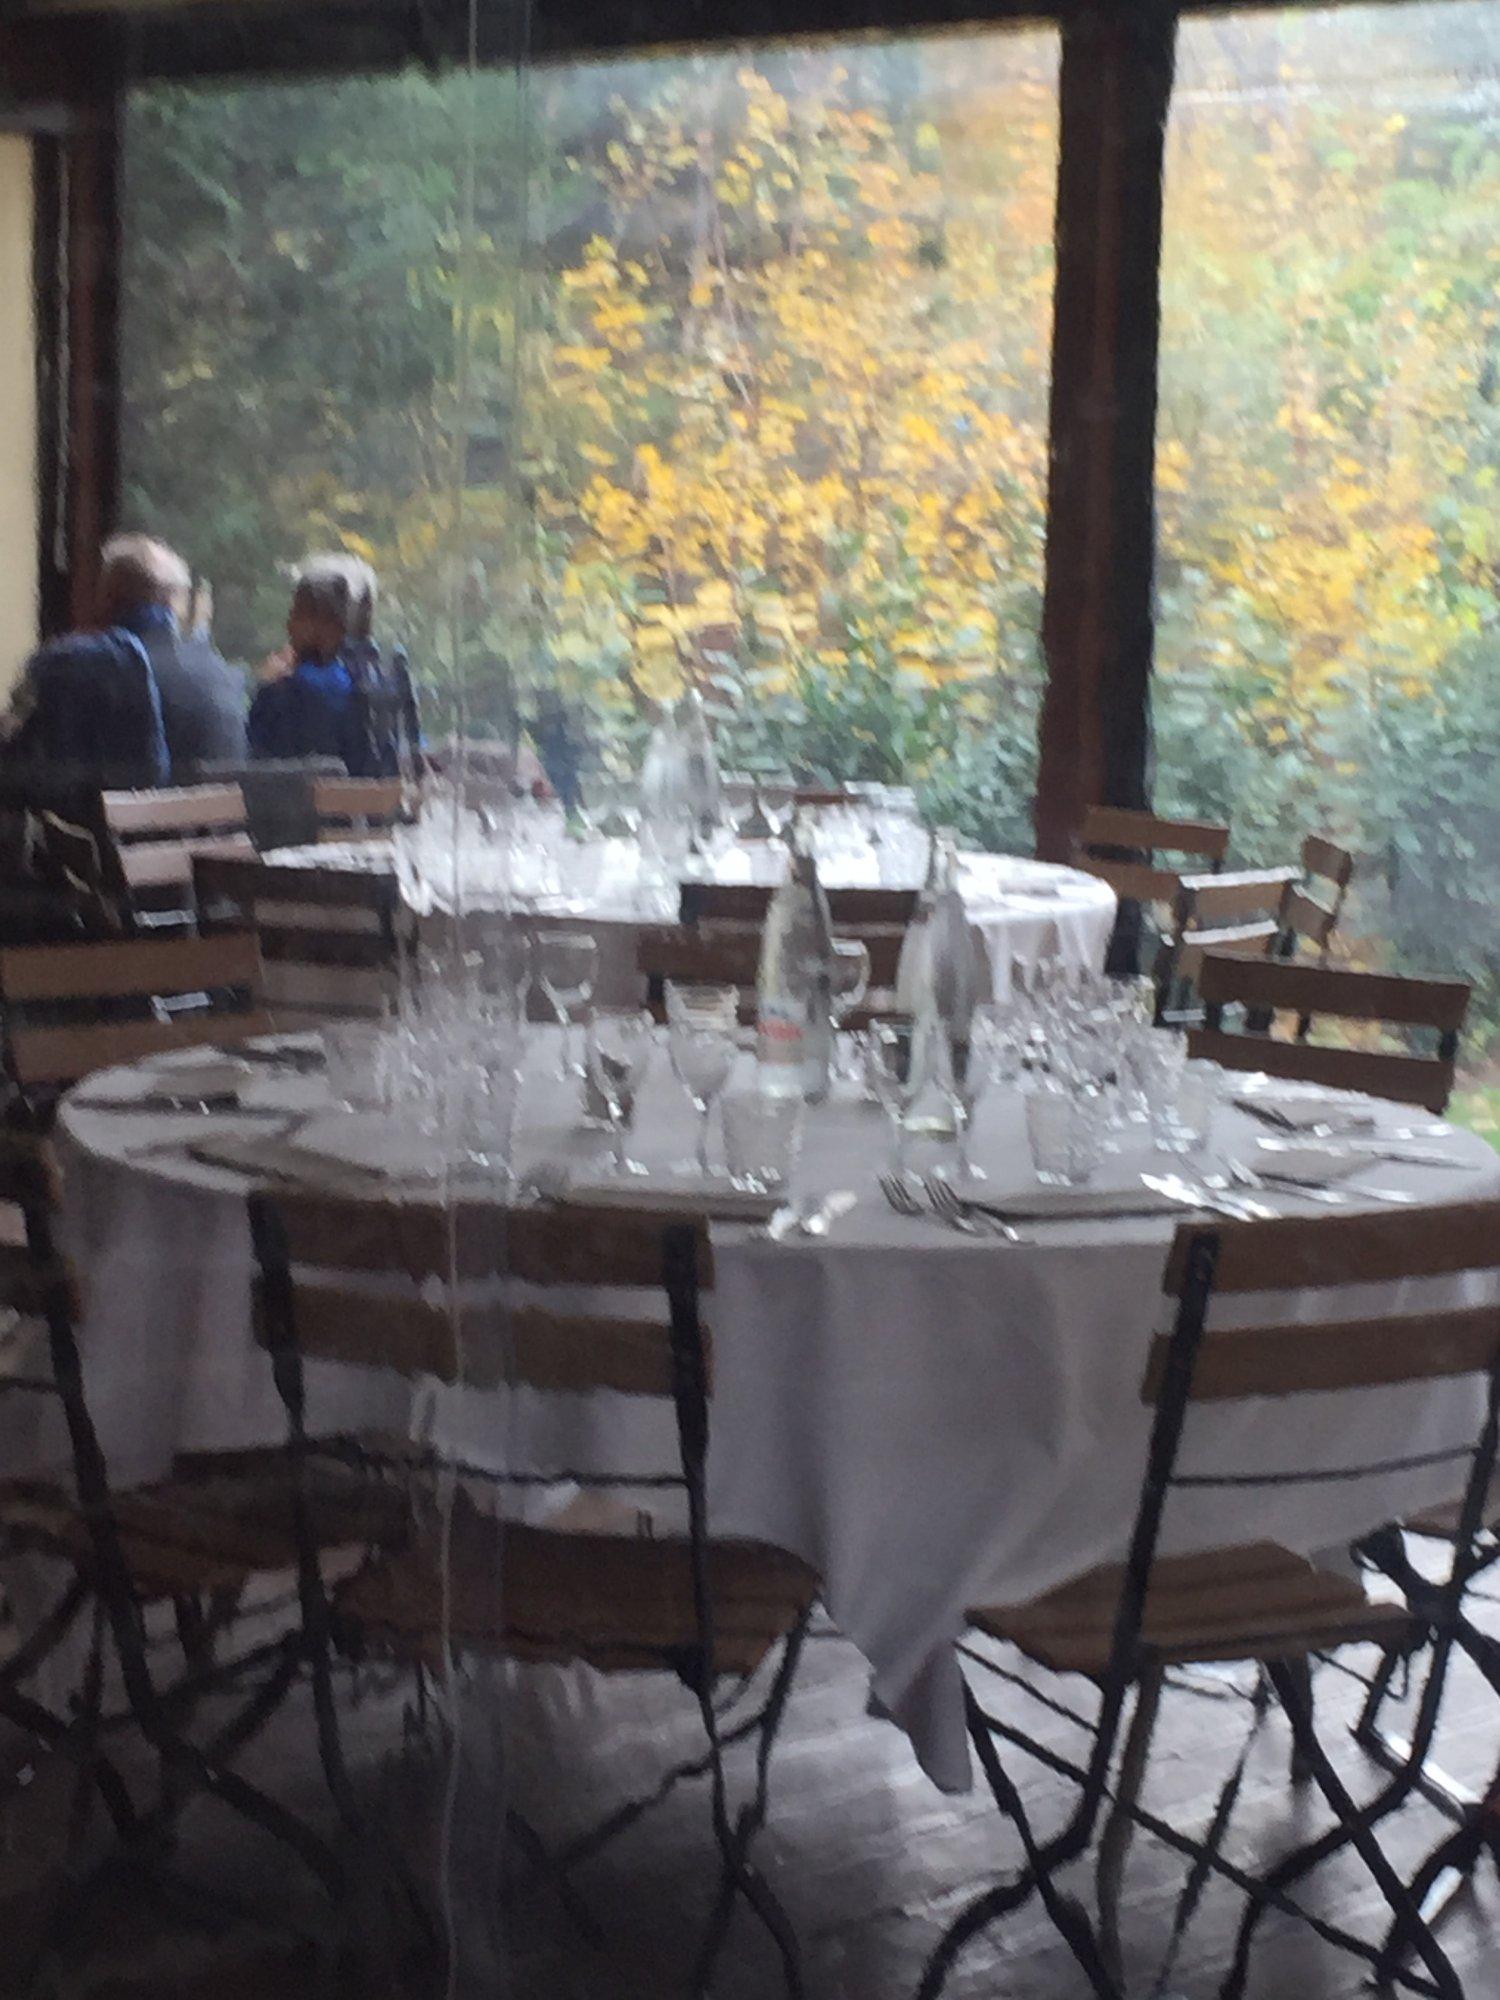 La Terrasse du Jardin Paris Restaurant Avis Numéro de